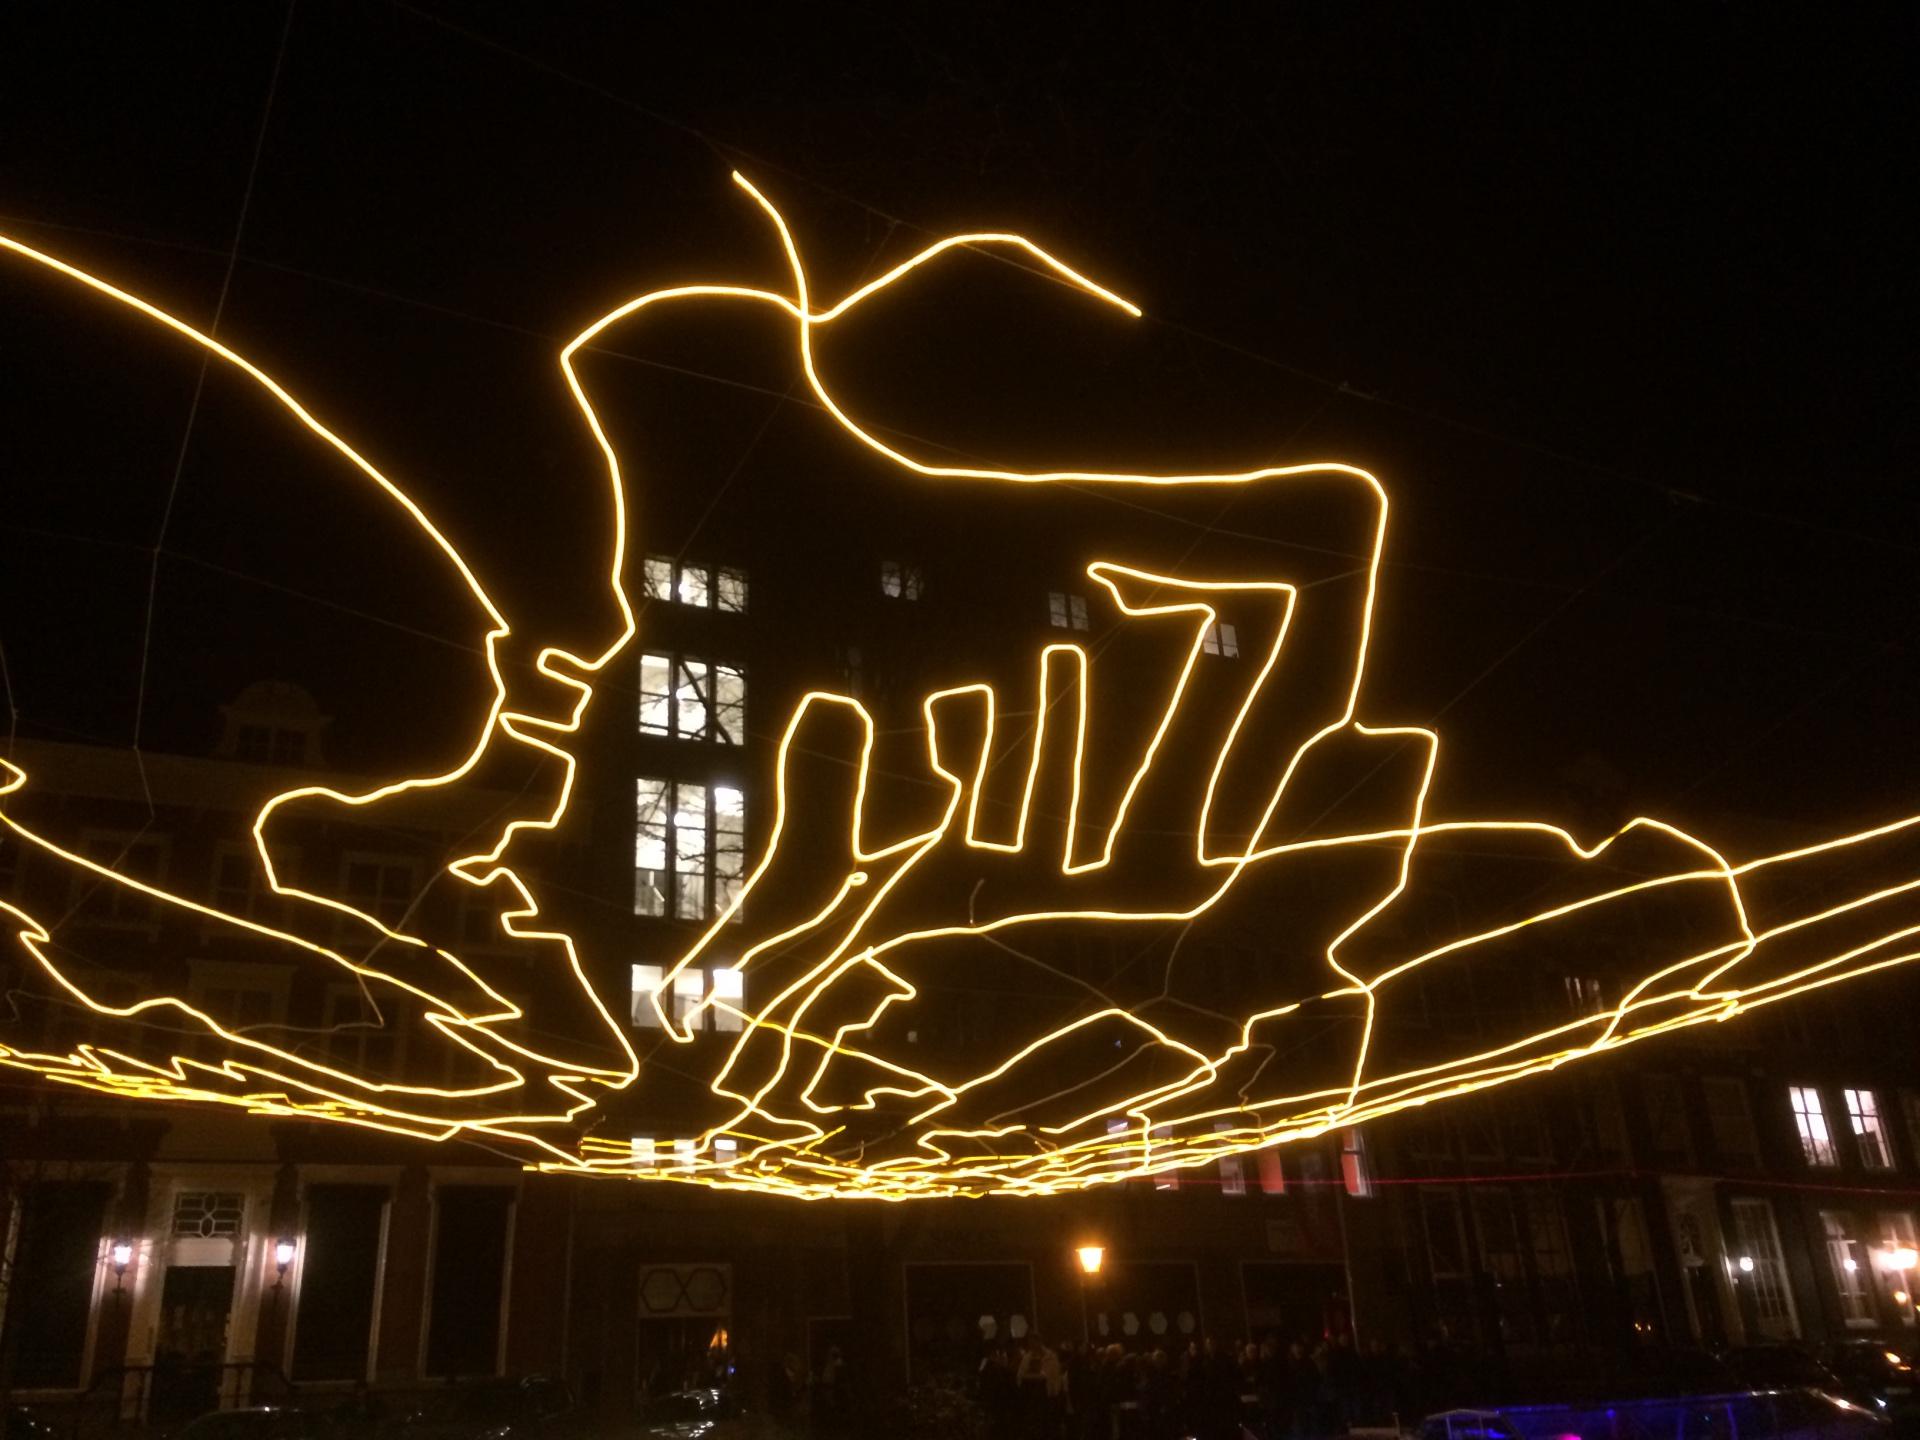 An illuminated artwork of the Amsterdam Light Festival